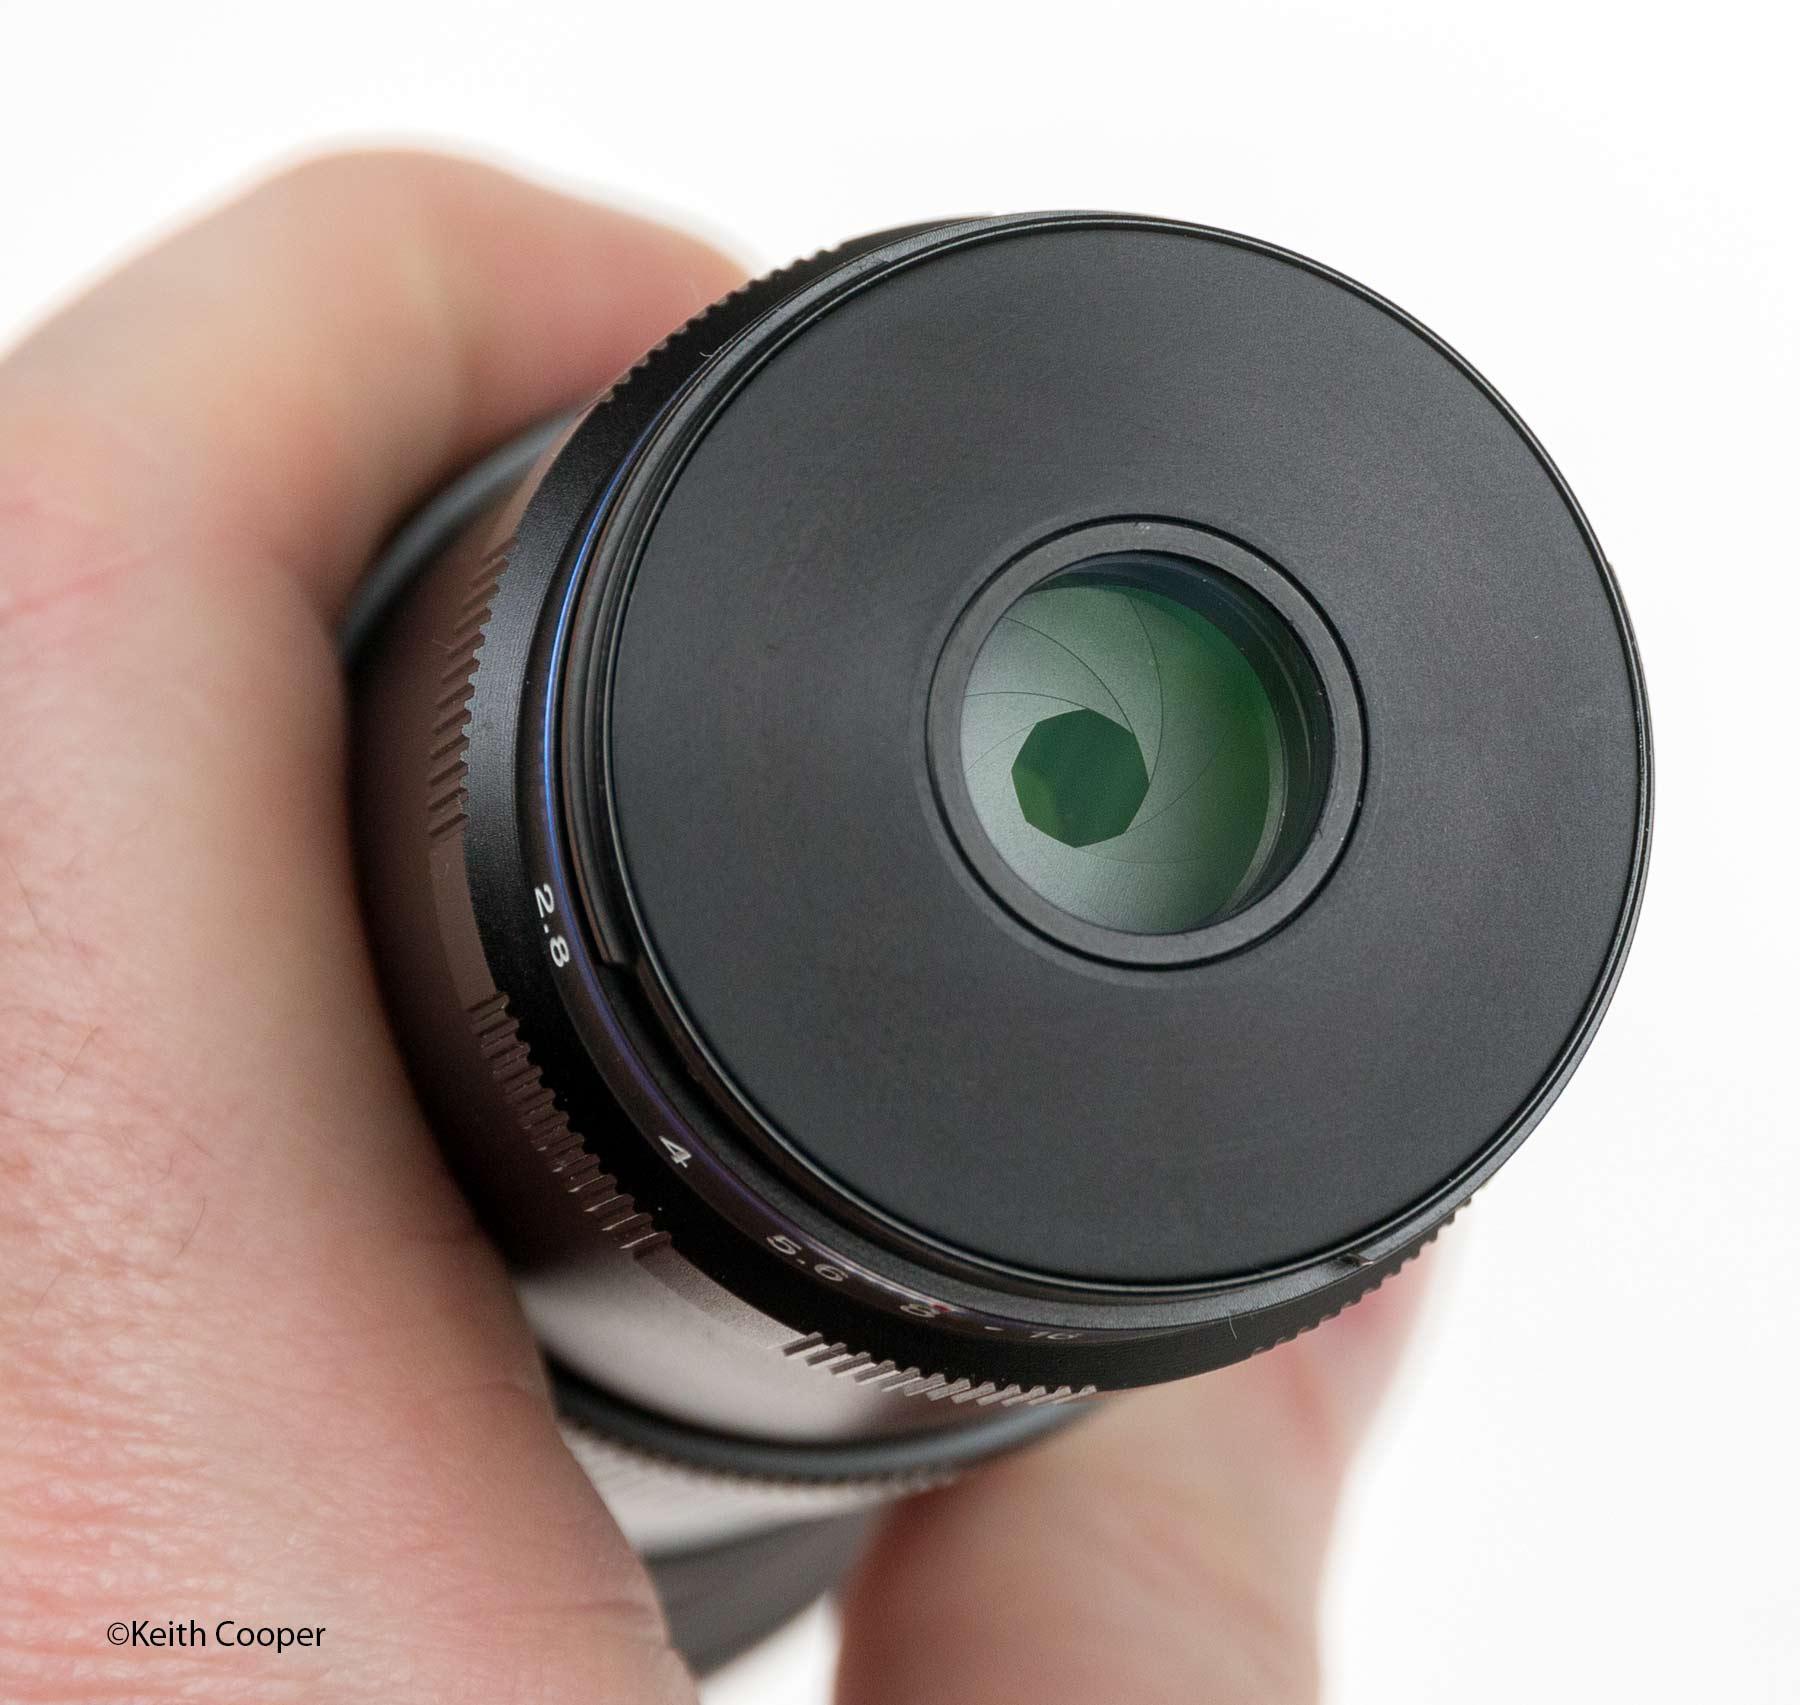 Laowa 25mm f/2 8 2 5x - 5x Ultra Macro lens review